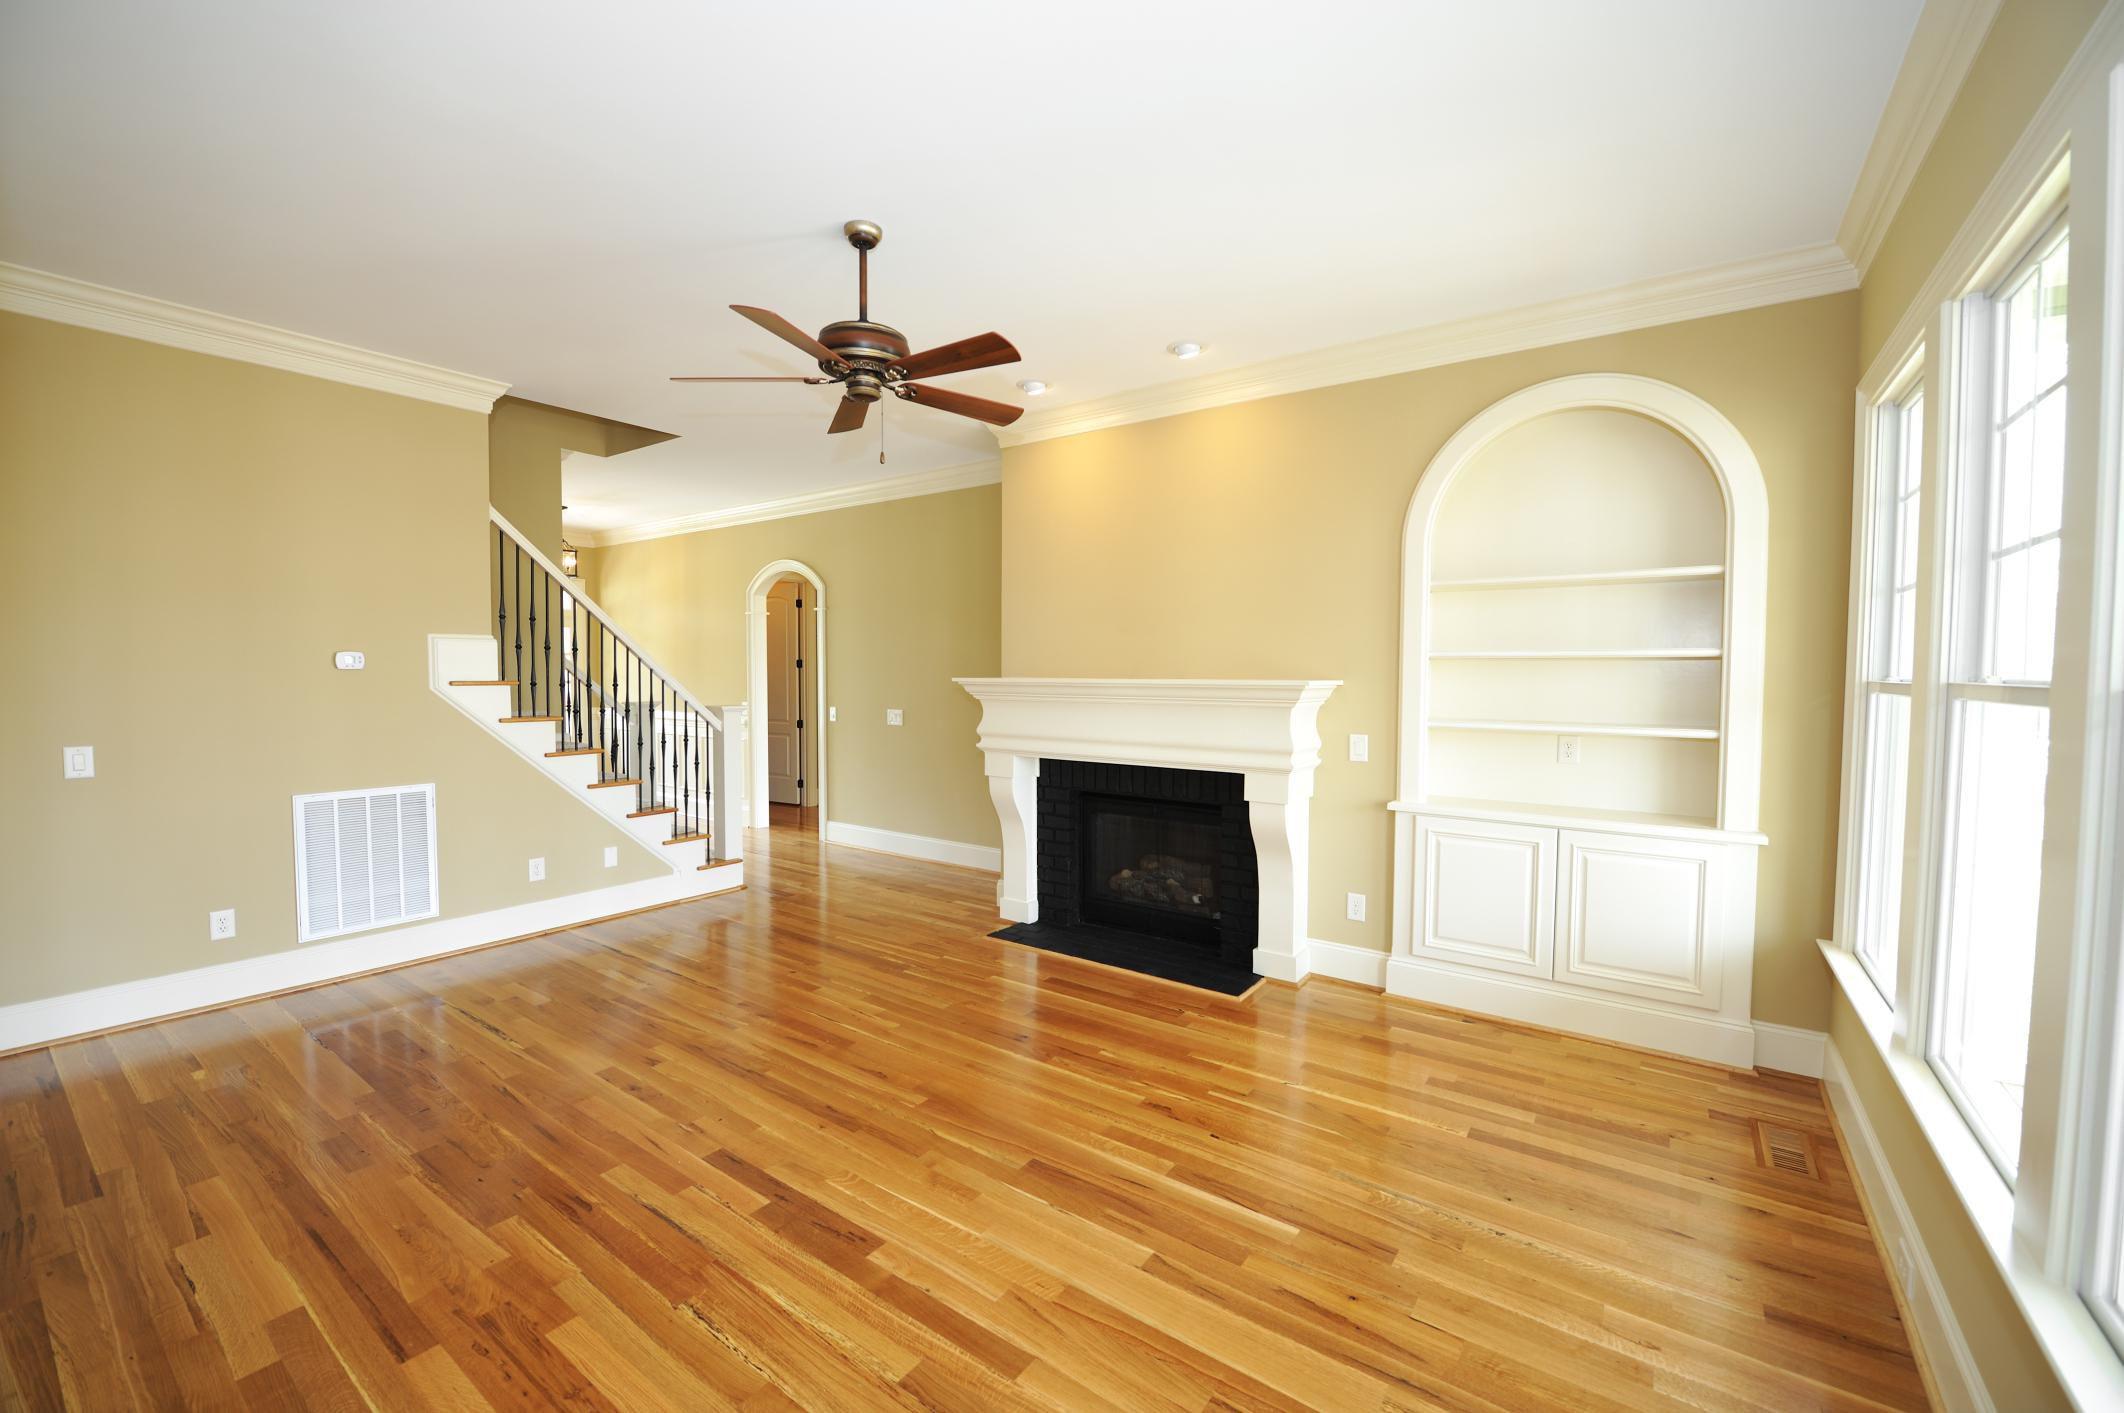 5 16 engineered hardwood flooring of solid and engineered wood flooring pertaining to 157328869 56a4a2ac5f9b58b7d0d7ef49